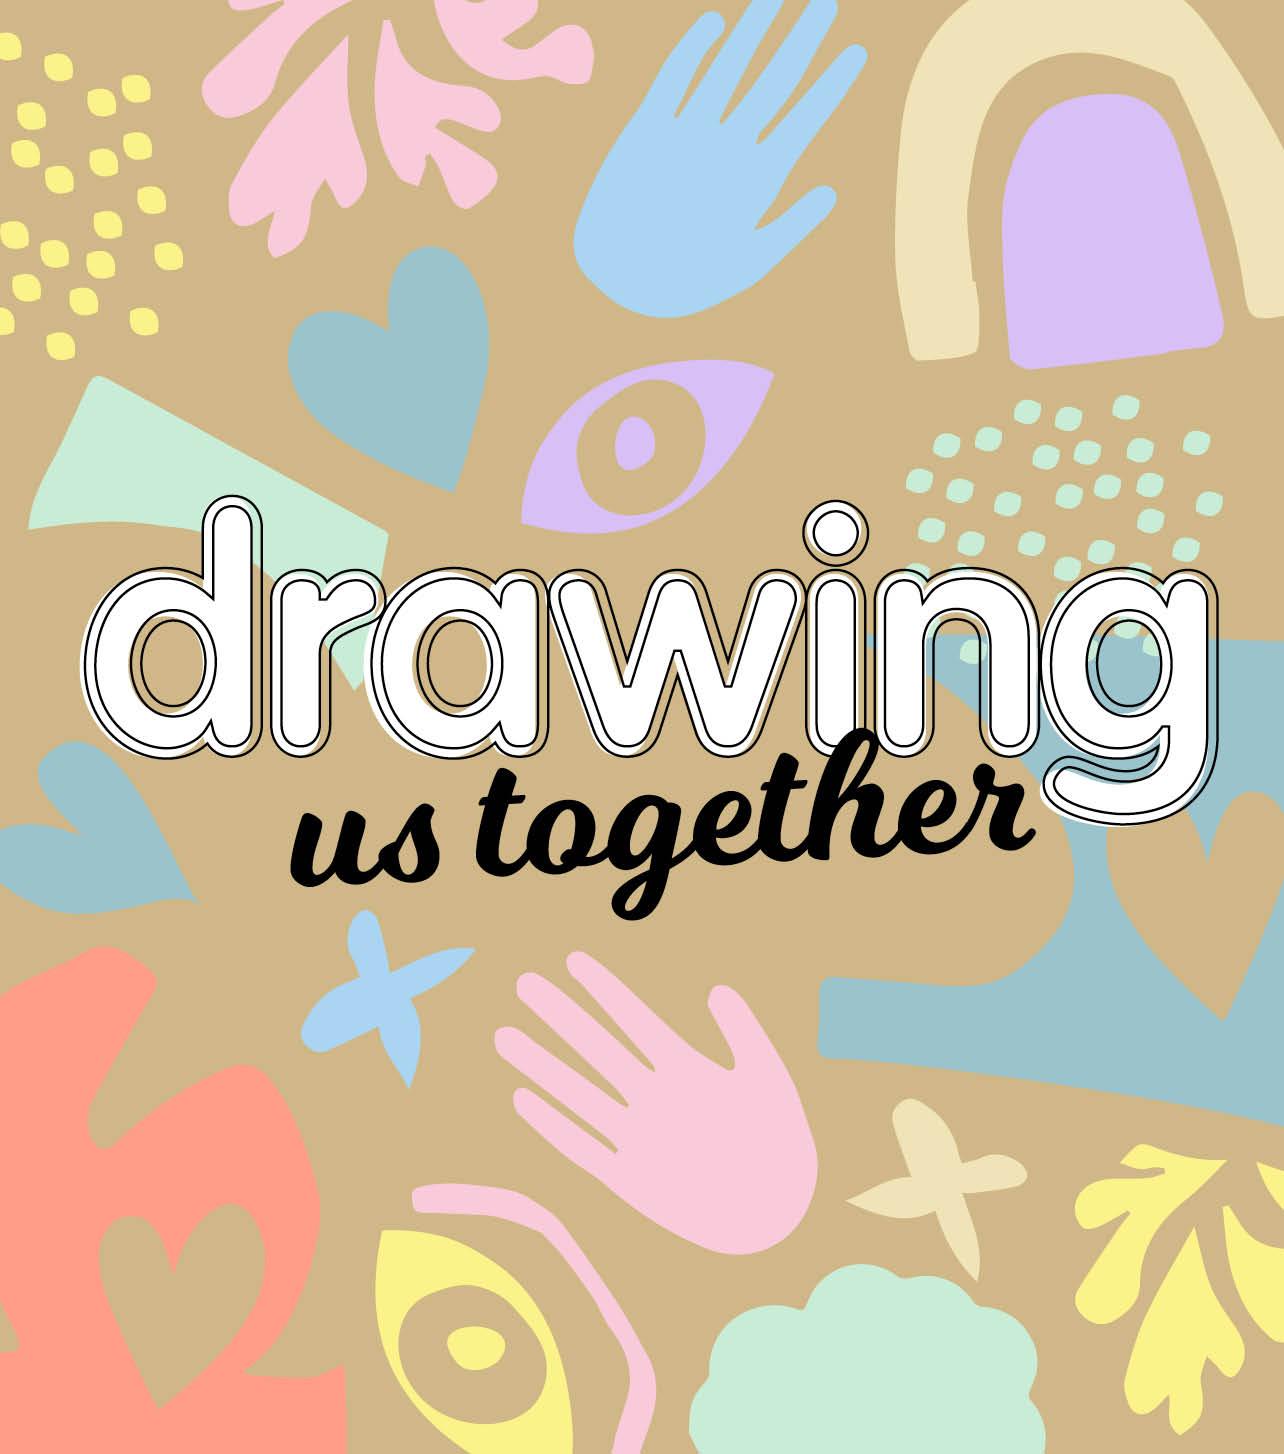 CH5251_Charter Hall_NAIDOC_Community Art Project_Web Tiles_Drawing_642x727